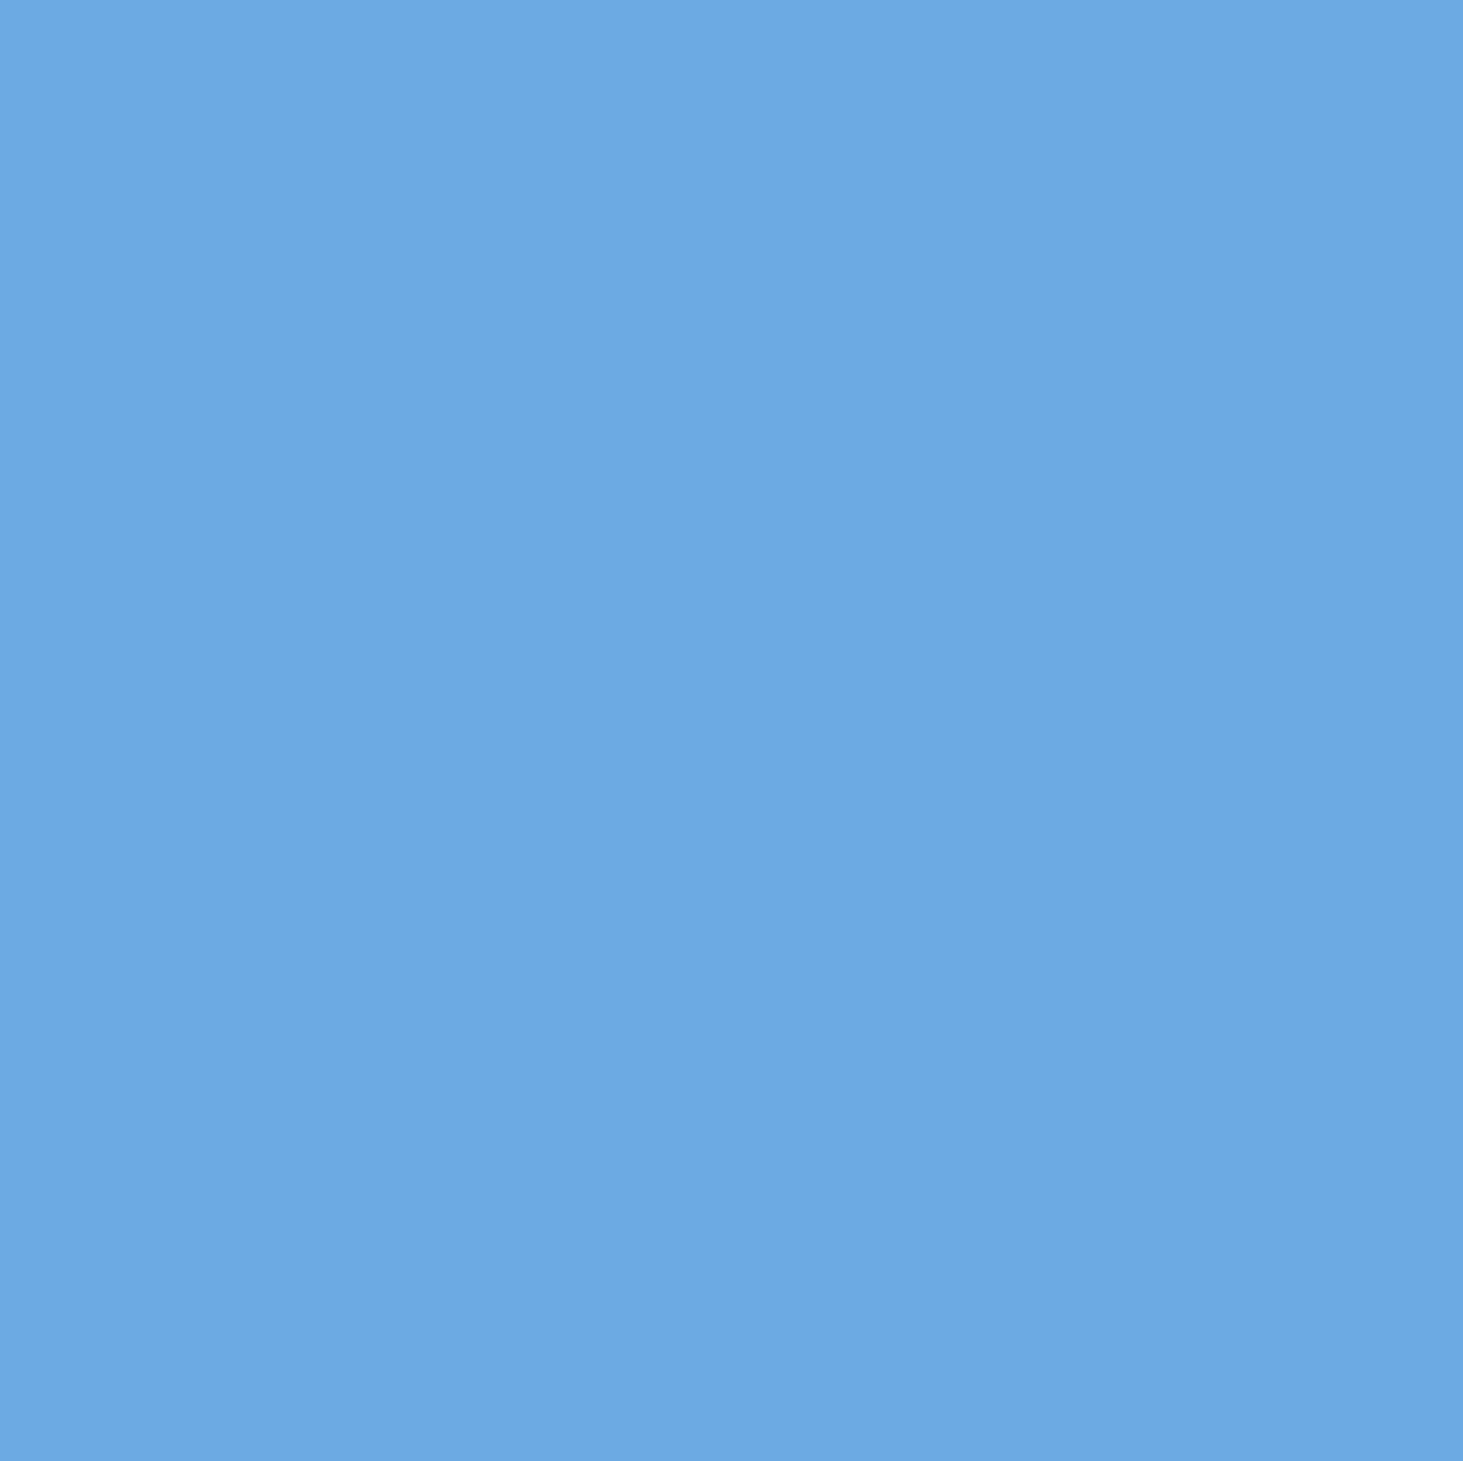 Background - Light Blue